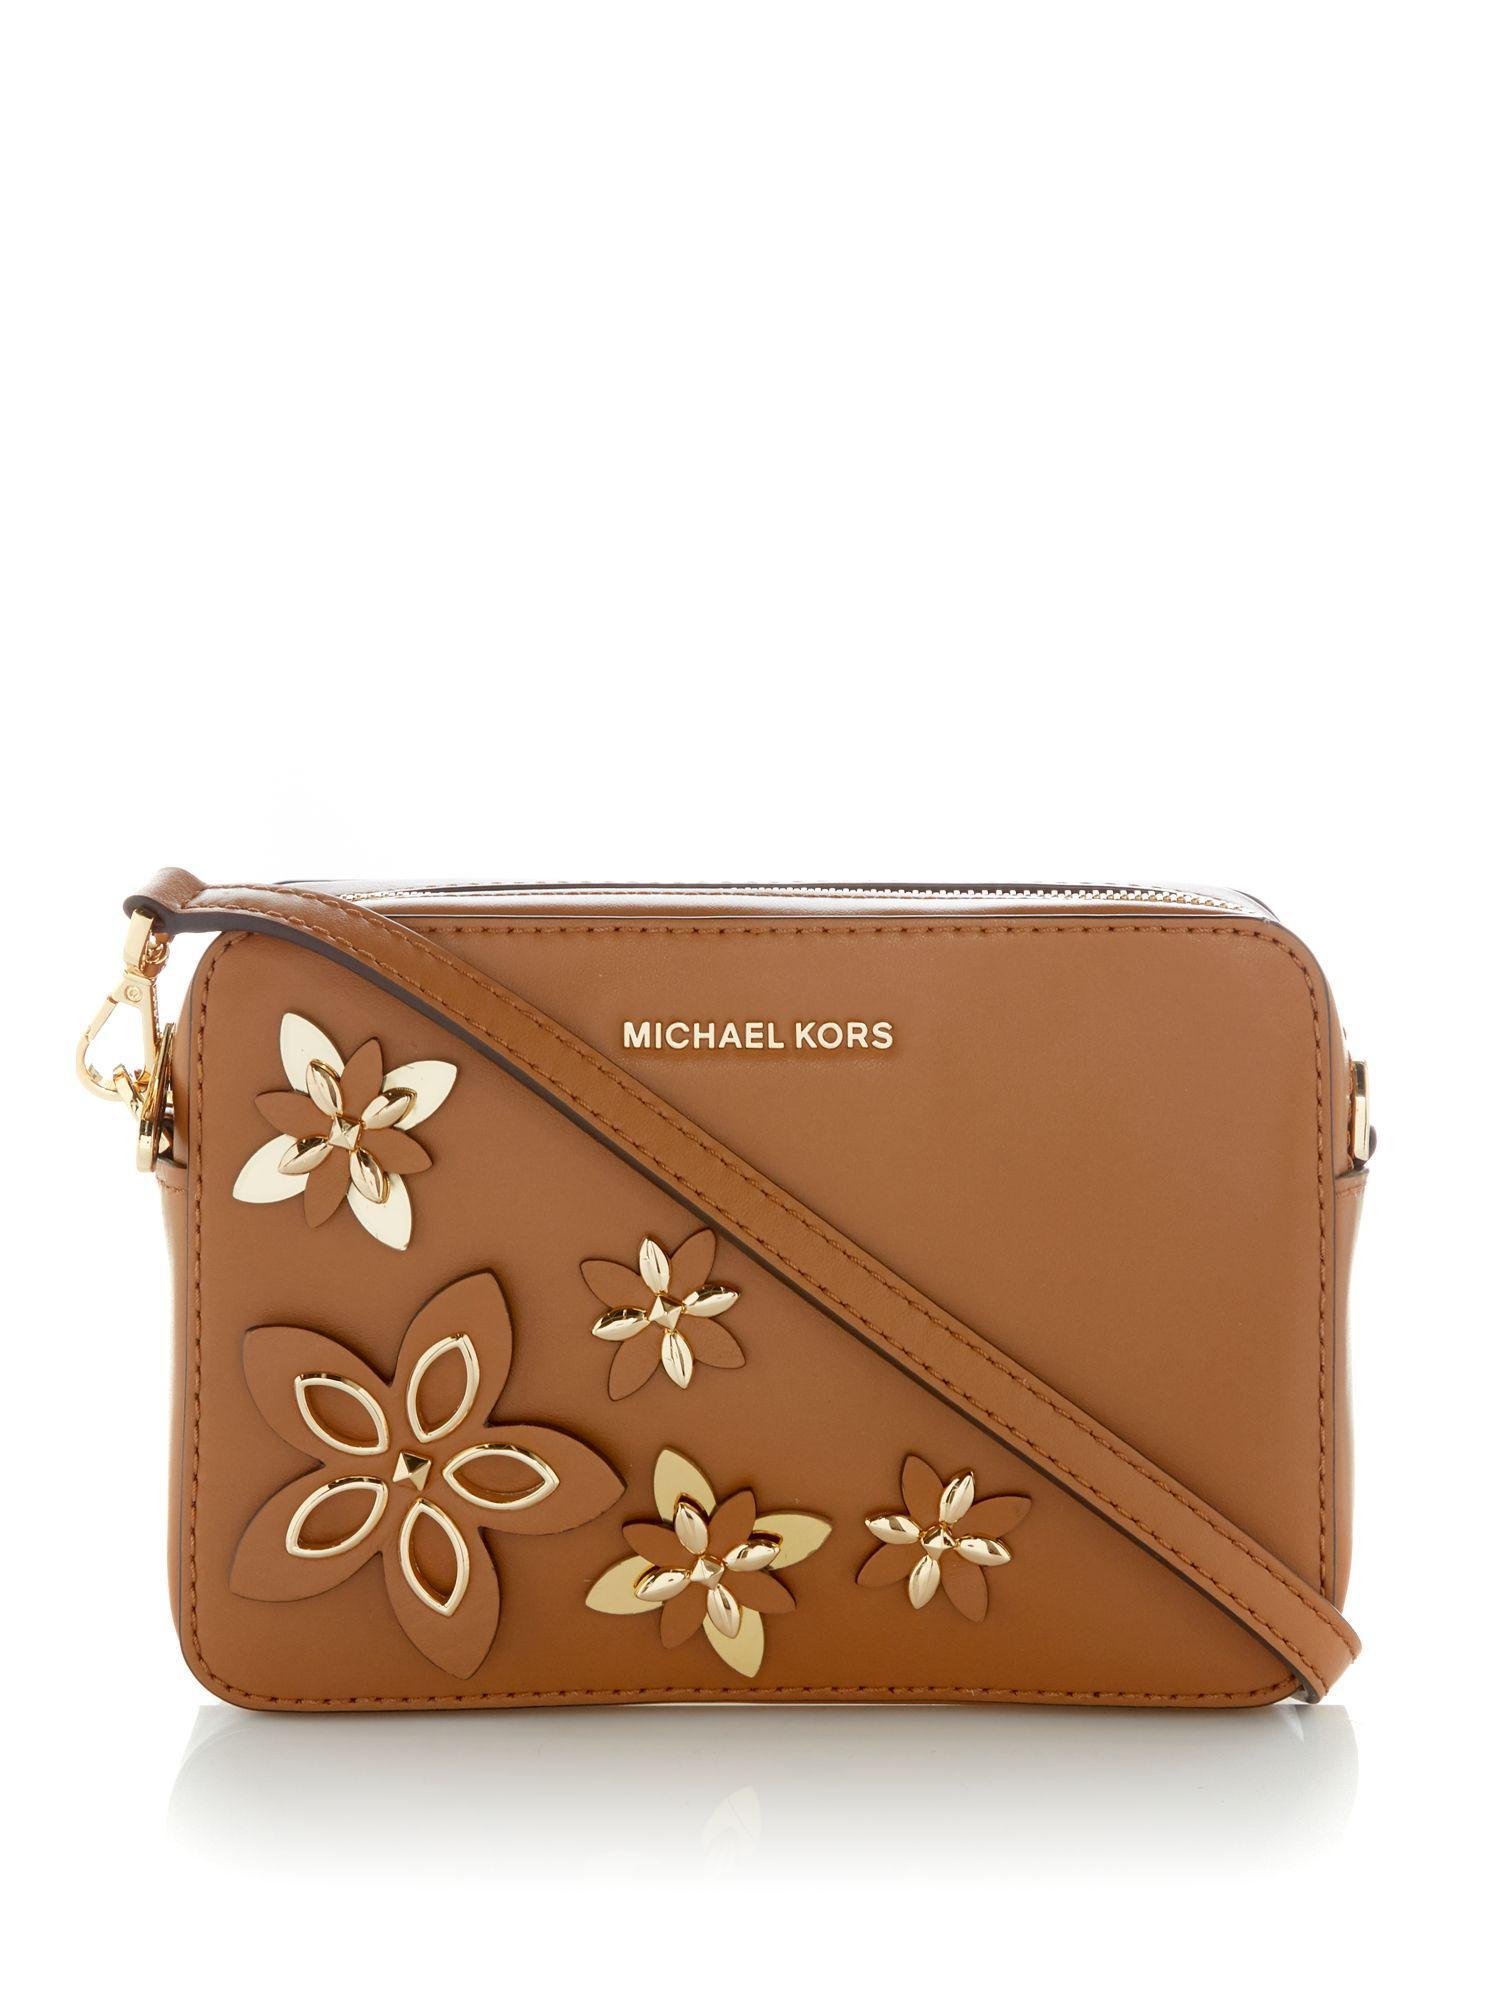 3062d7cd35d1 Michael kors Flowers Pouches Crossbody Bag in Brown